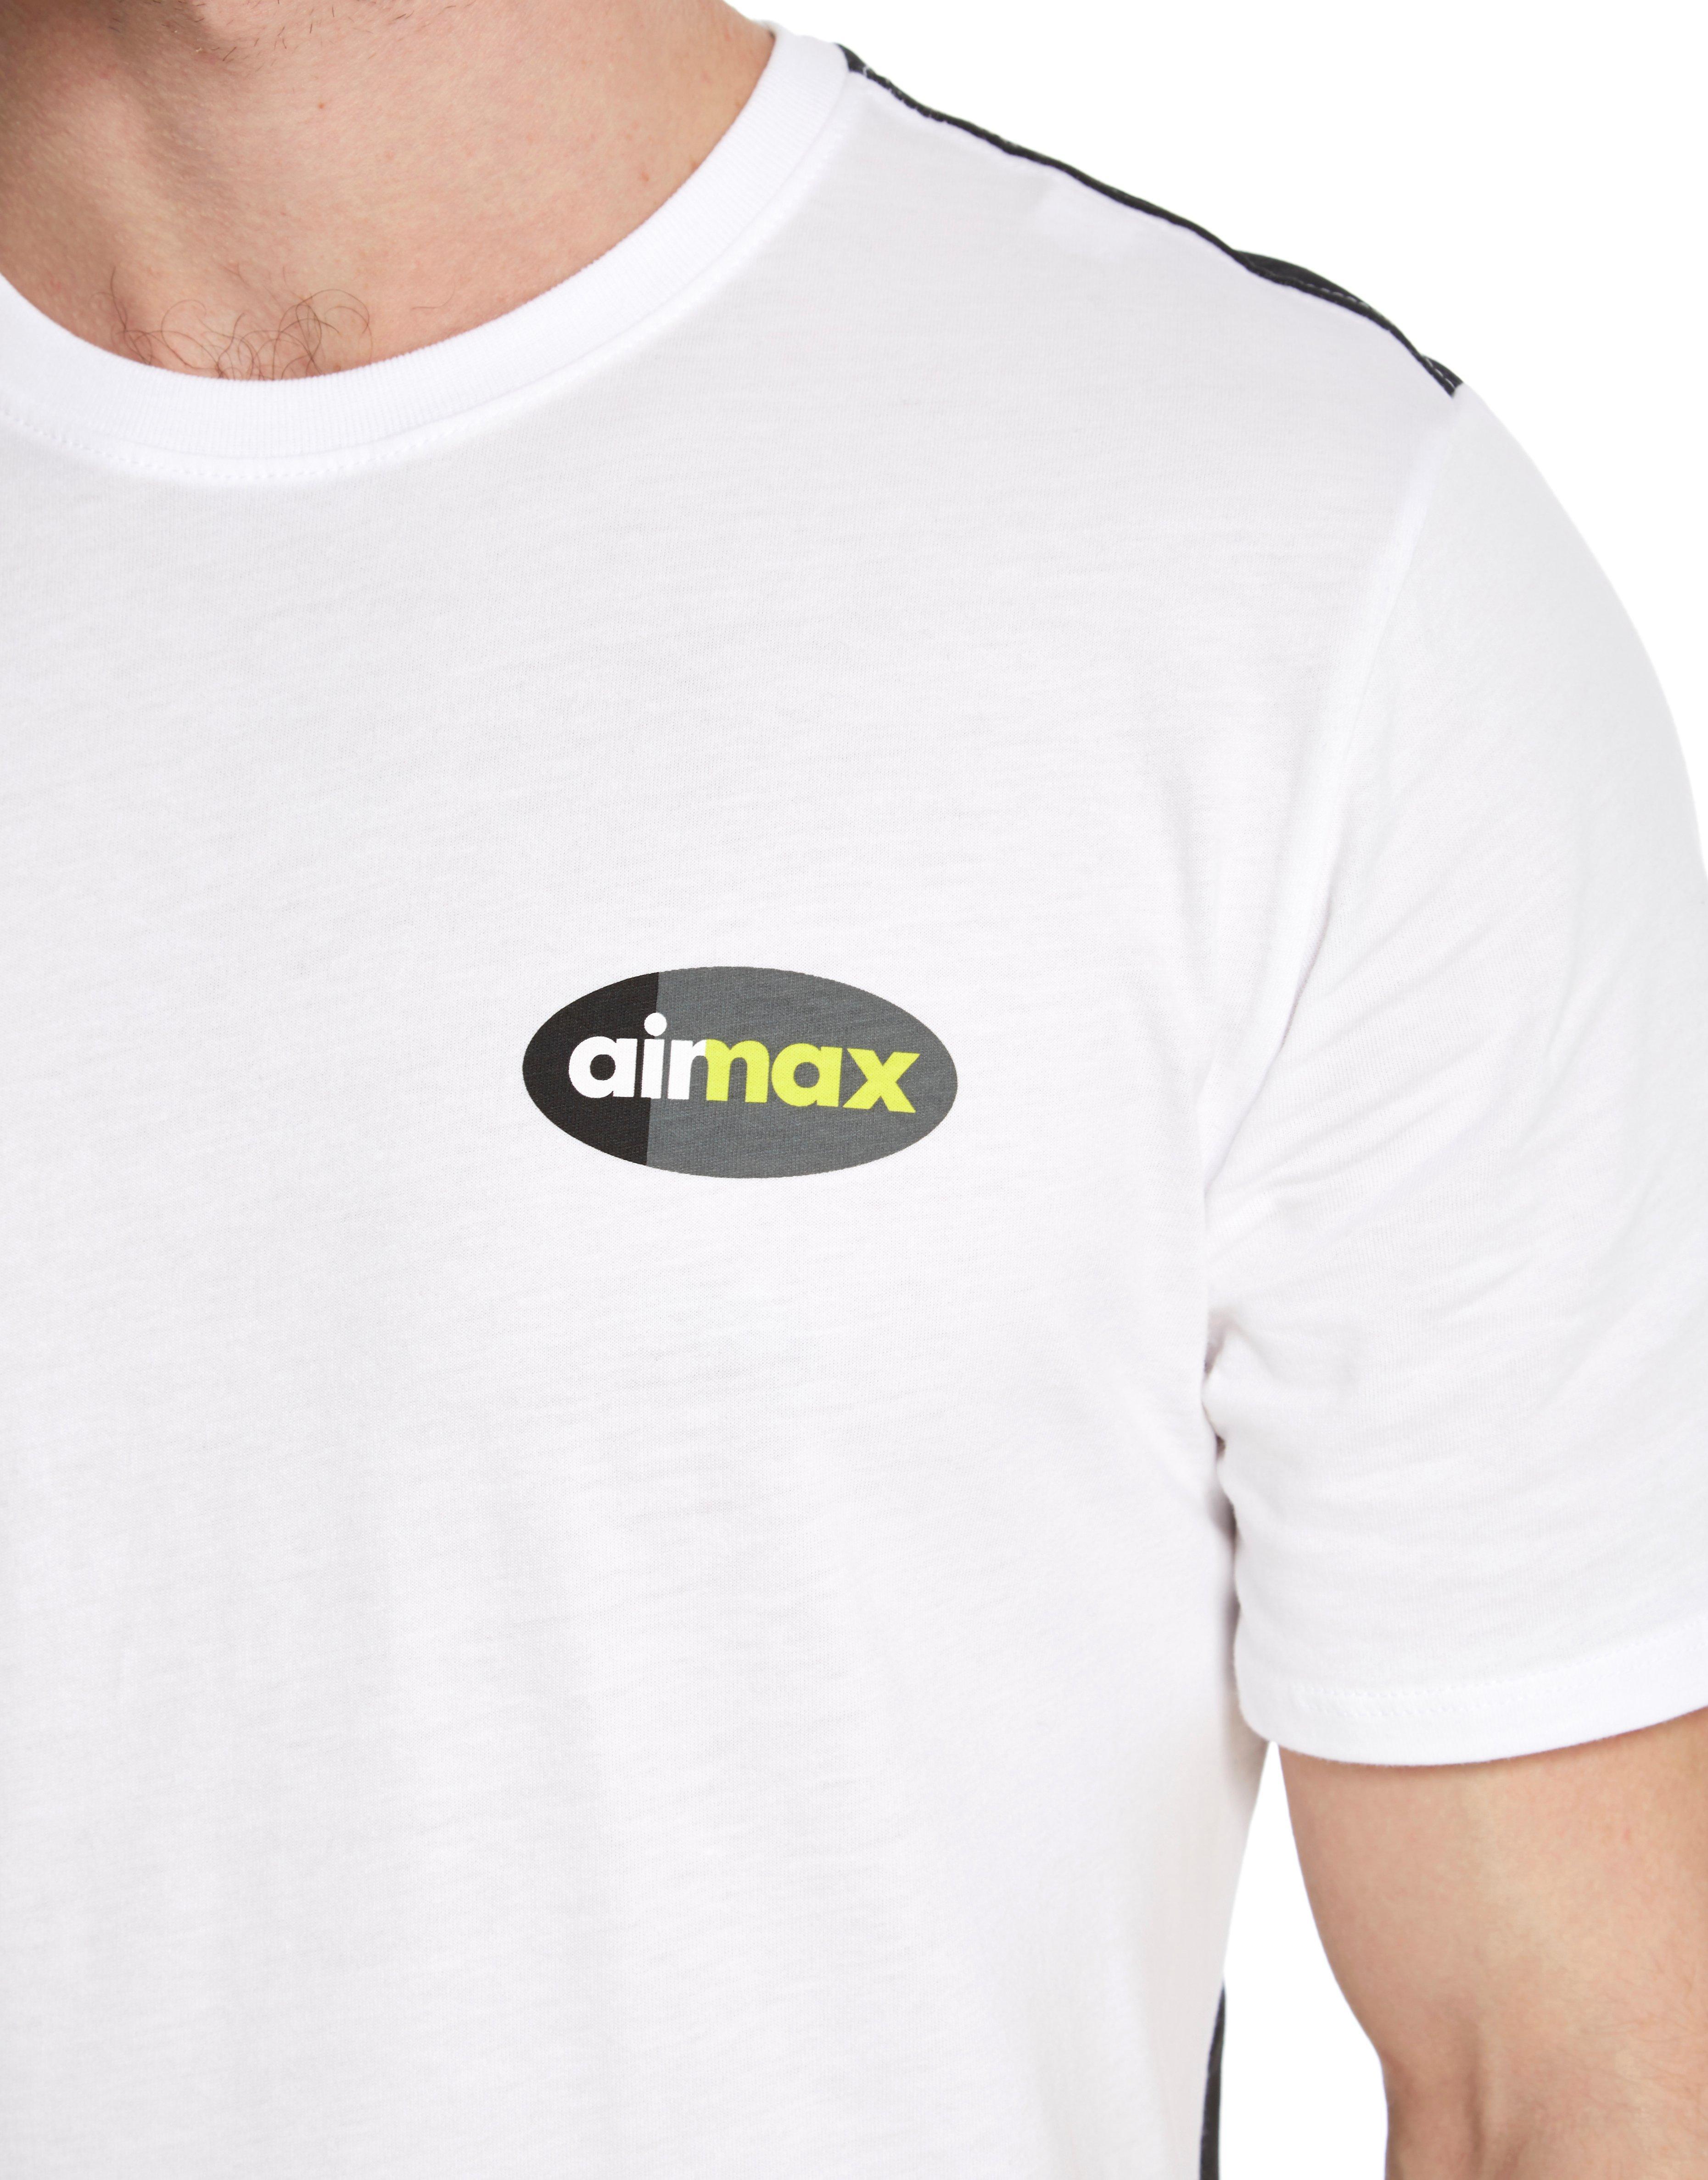 air max 95 t